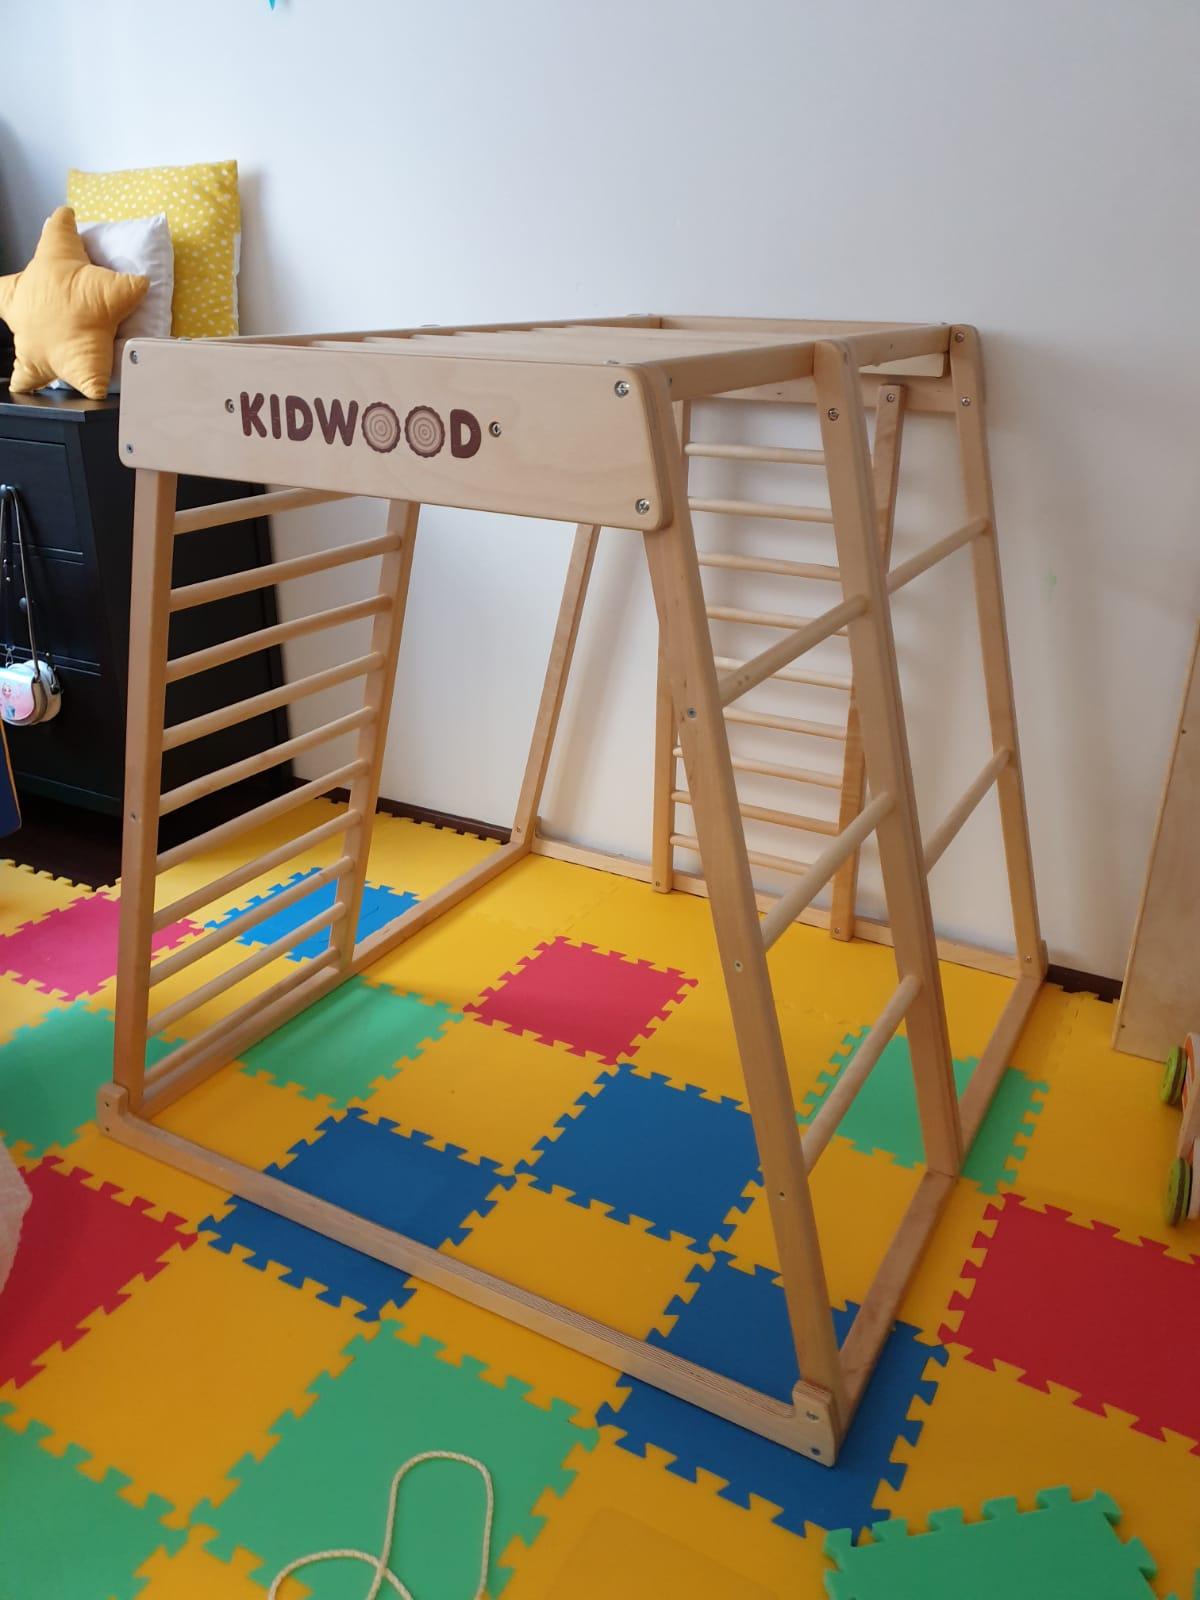 Kidwood (Modell Rakete)